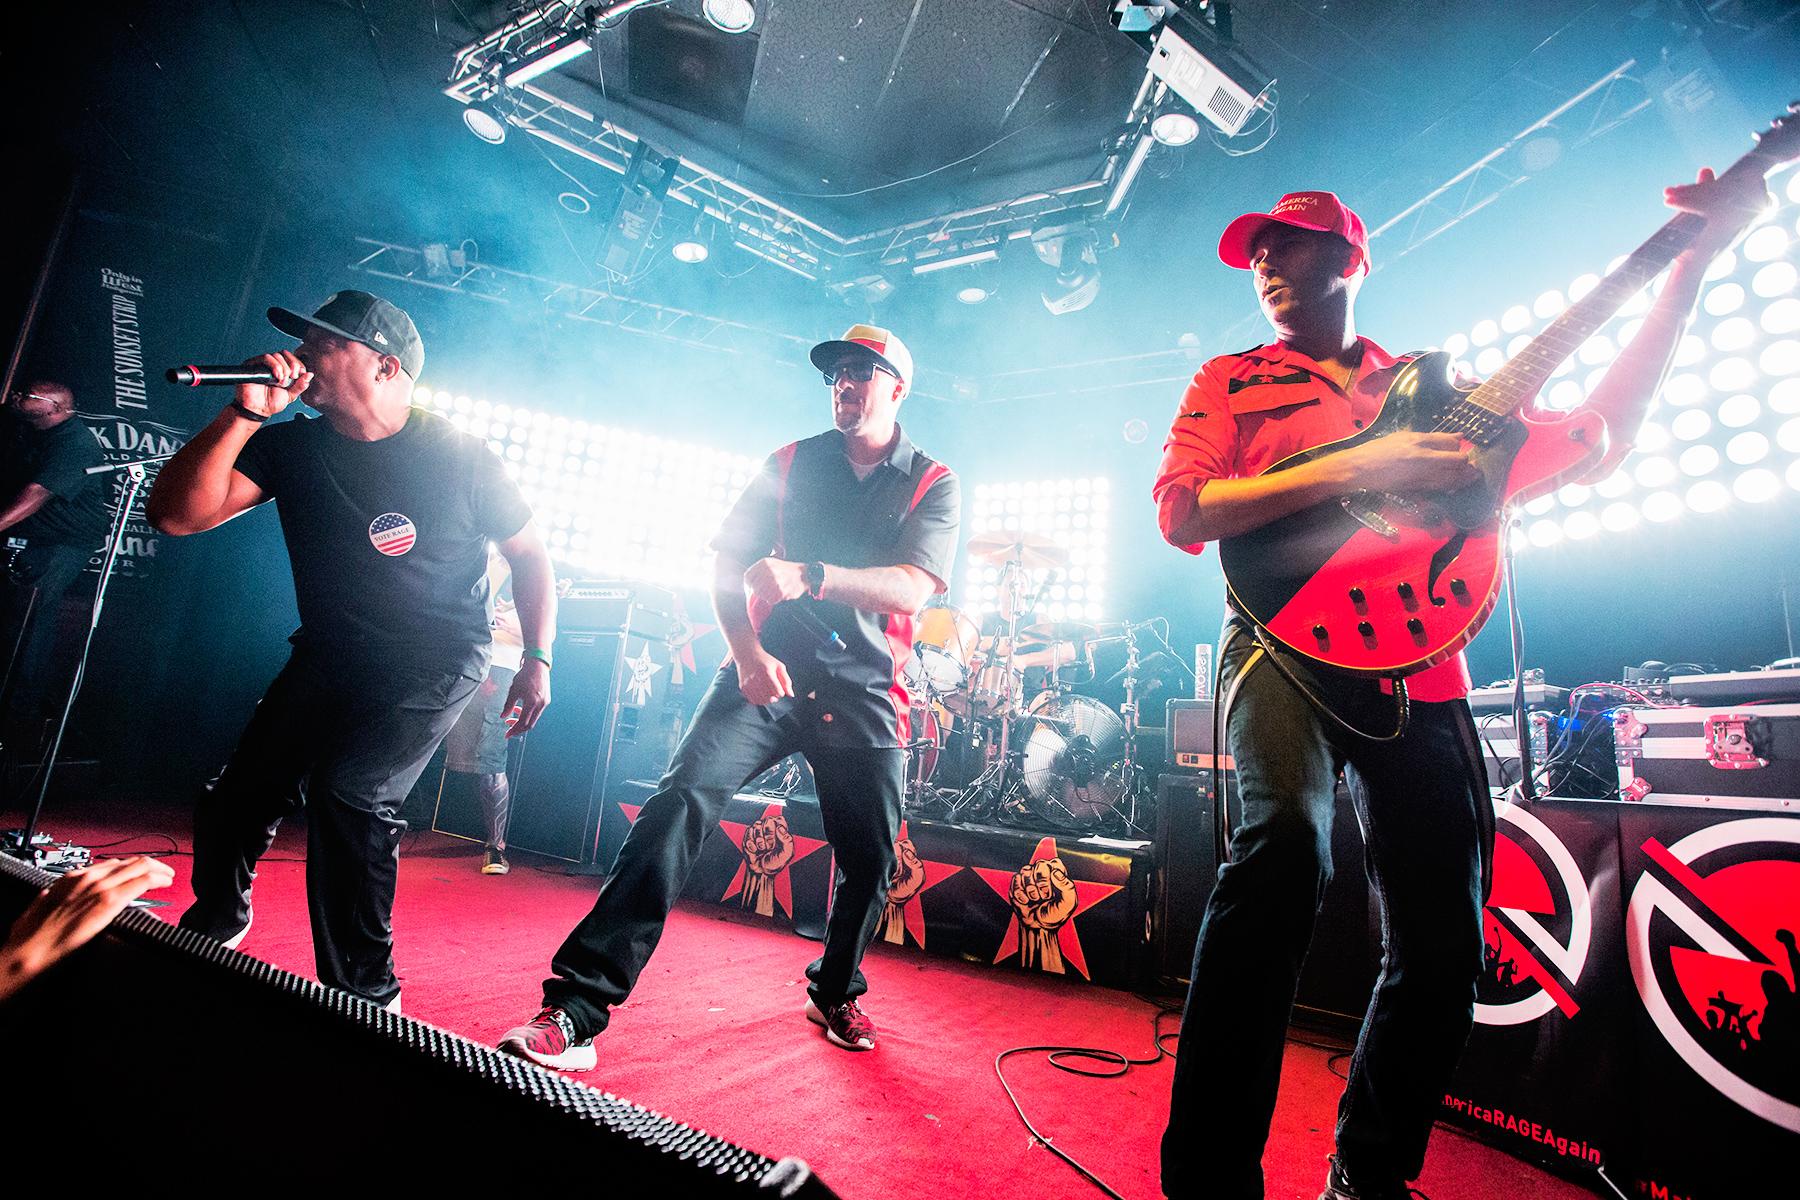 Prophets of Rage Set Defiant Tone at Explosive L.A. Debut